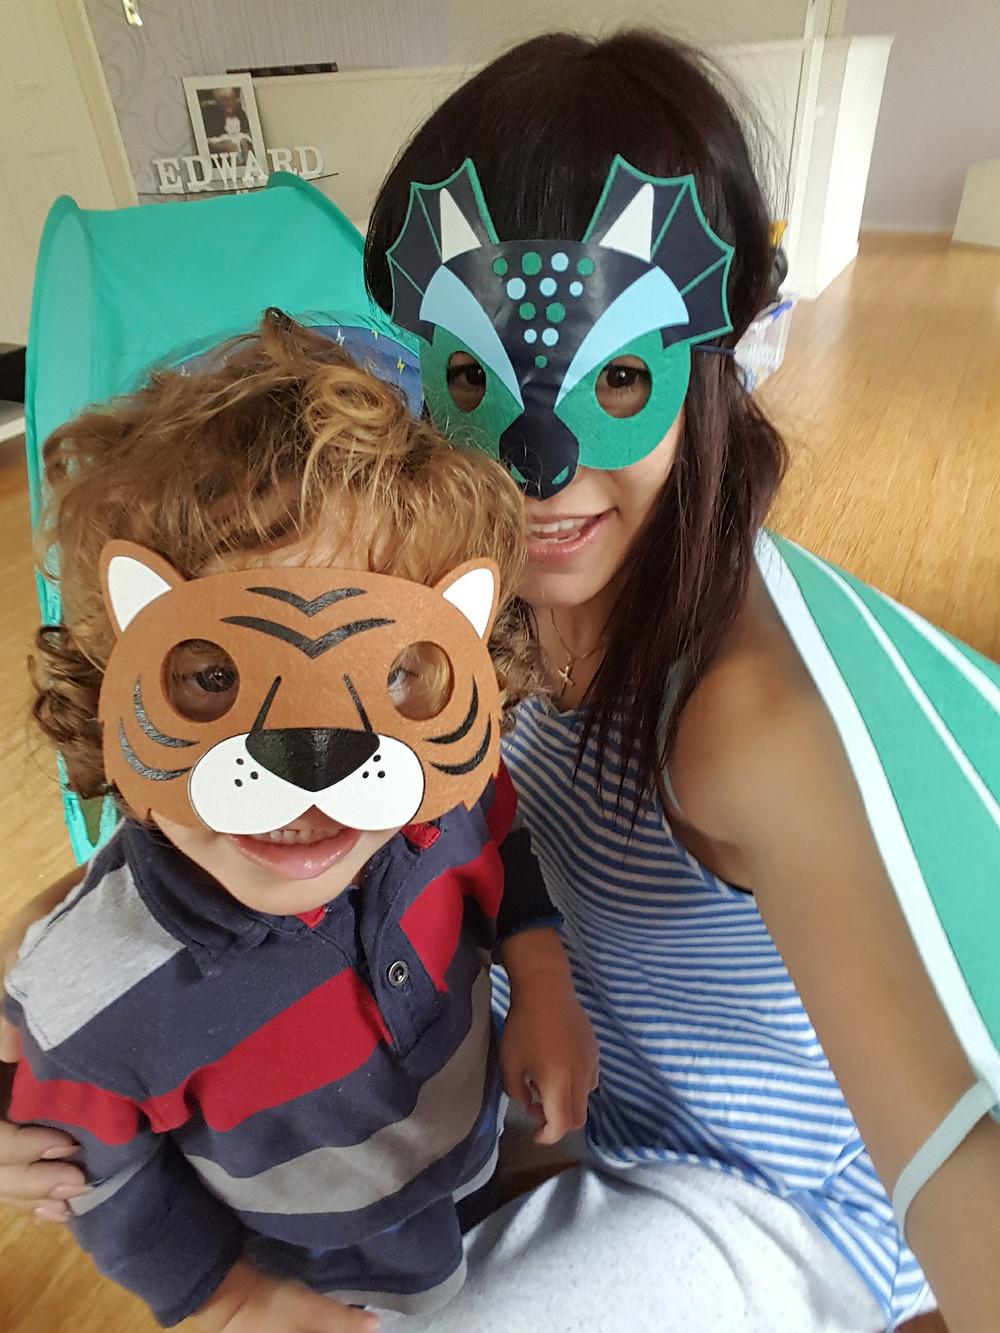 Toddler Seizures Epilepsy PCOS Mummy Blogger Wellness Fitness Mum Blog